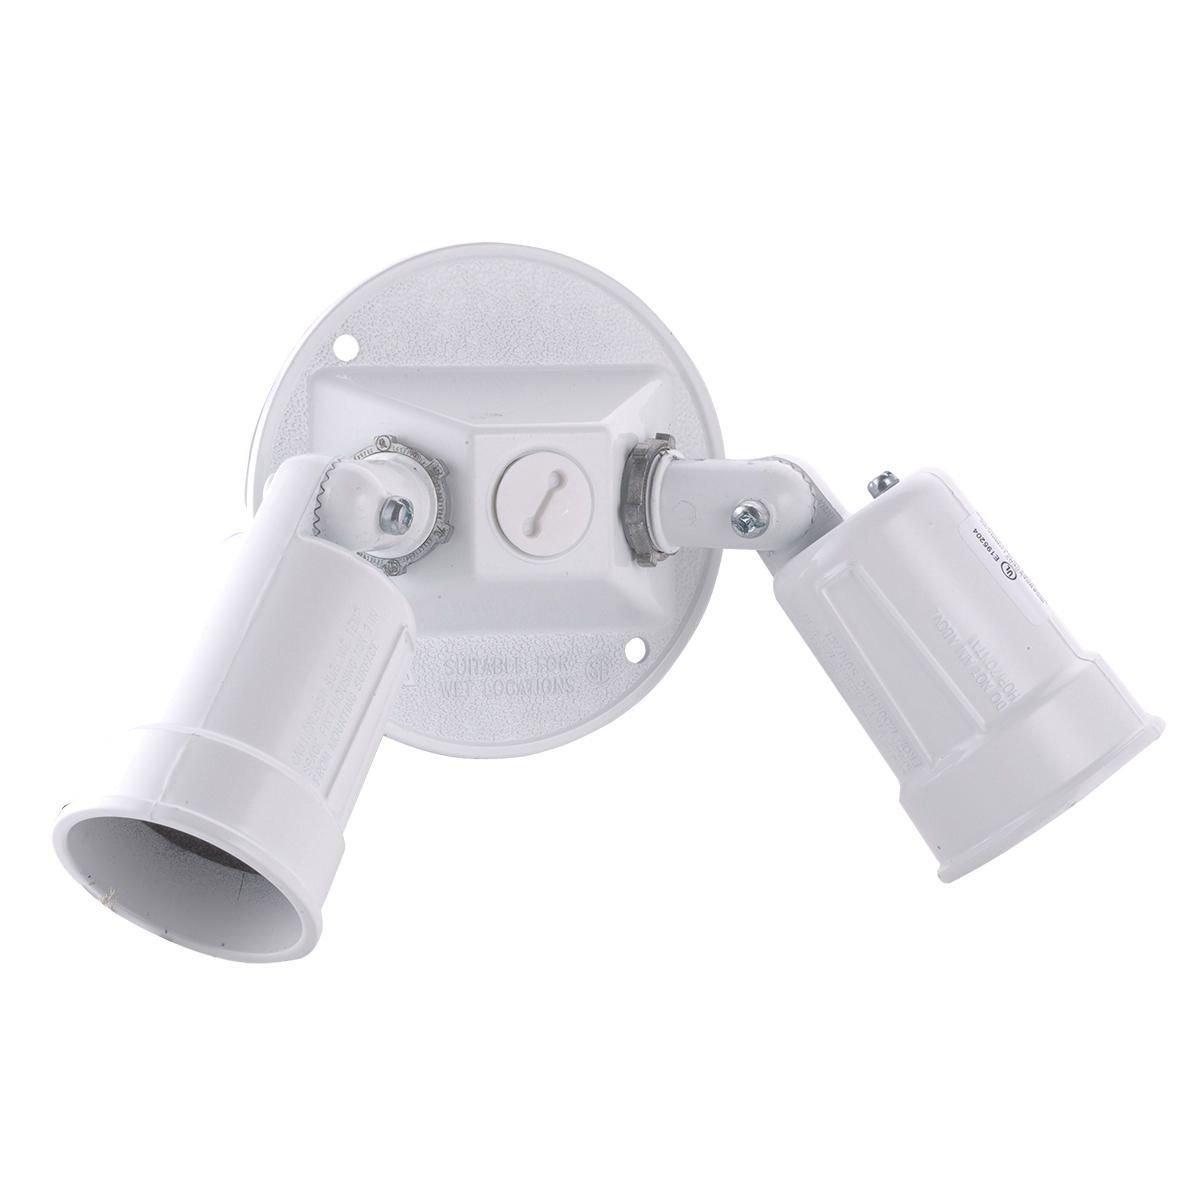 Hubbell Raco 5625-6 Hubbell 5625 Weatherproof Combination Lamp Holder, 75-150 W, Par 38, Die Cast Zinc, White